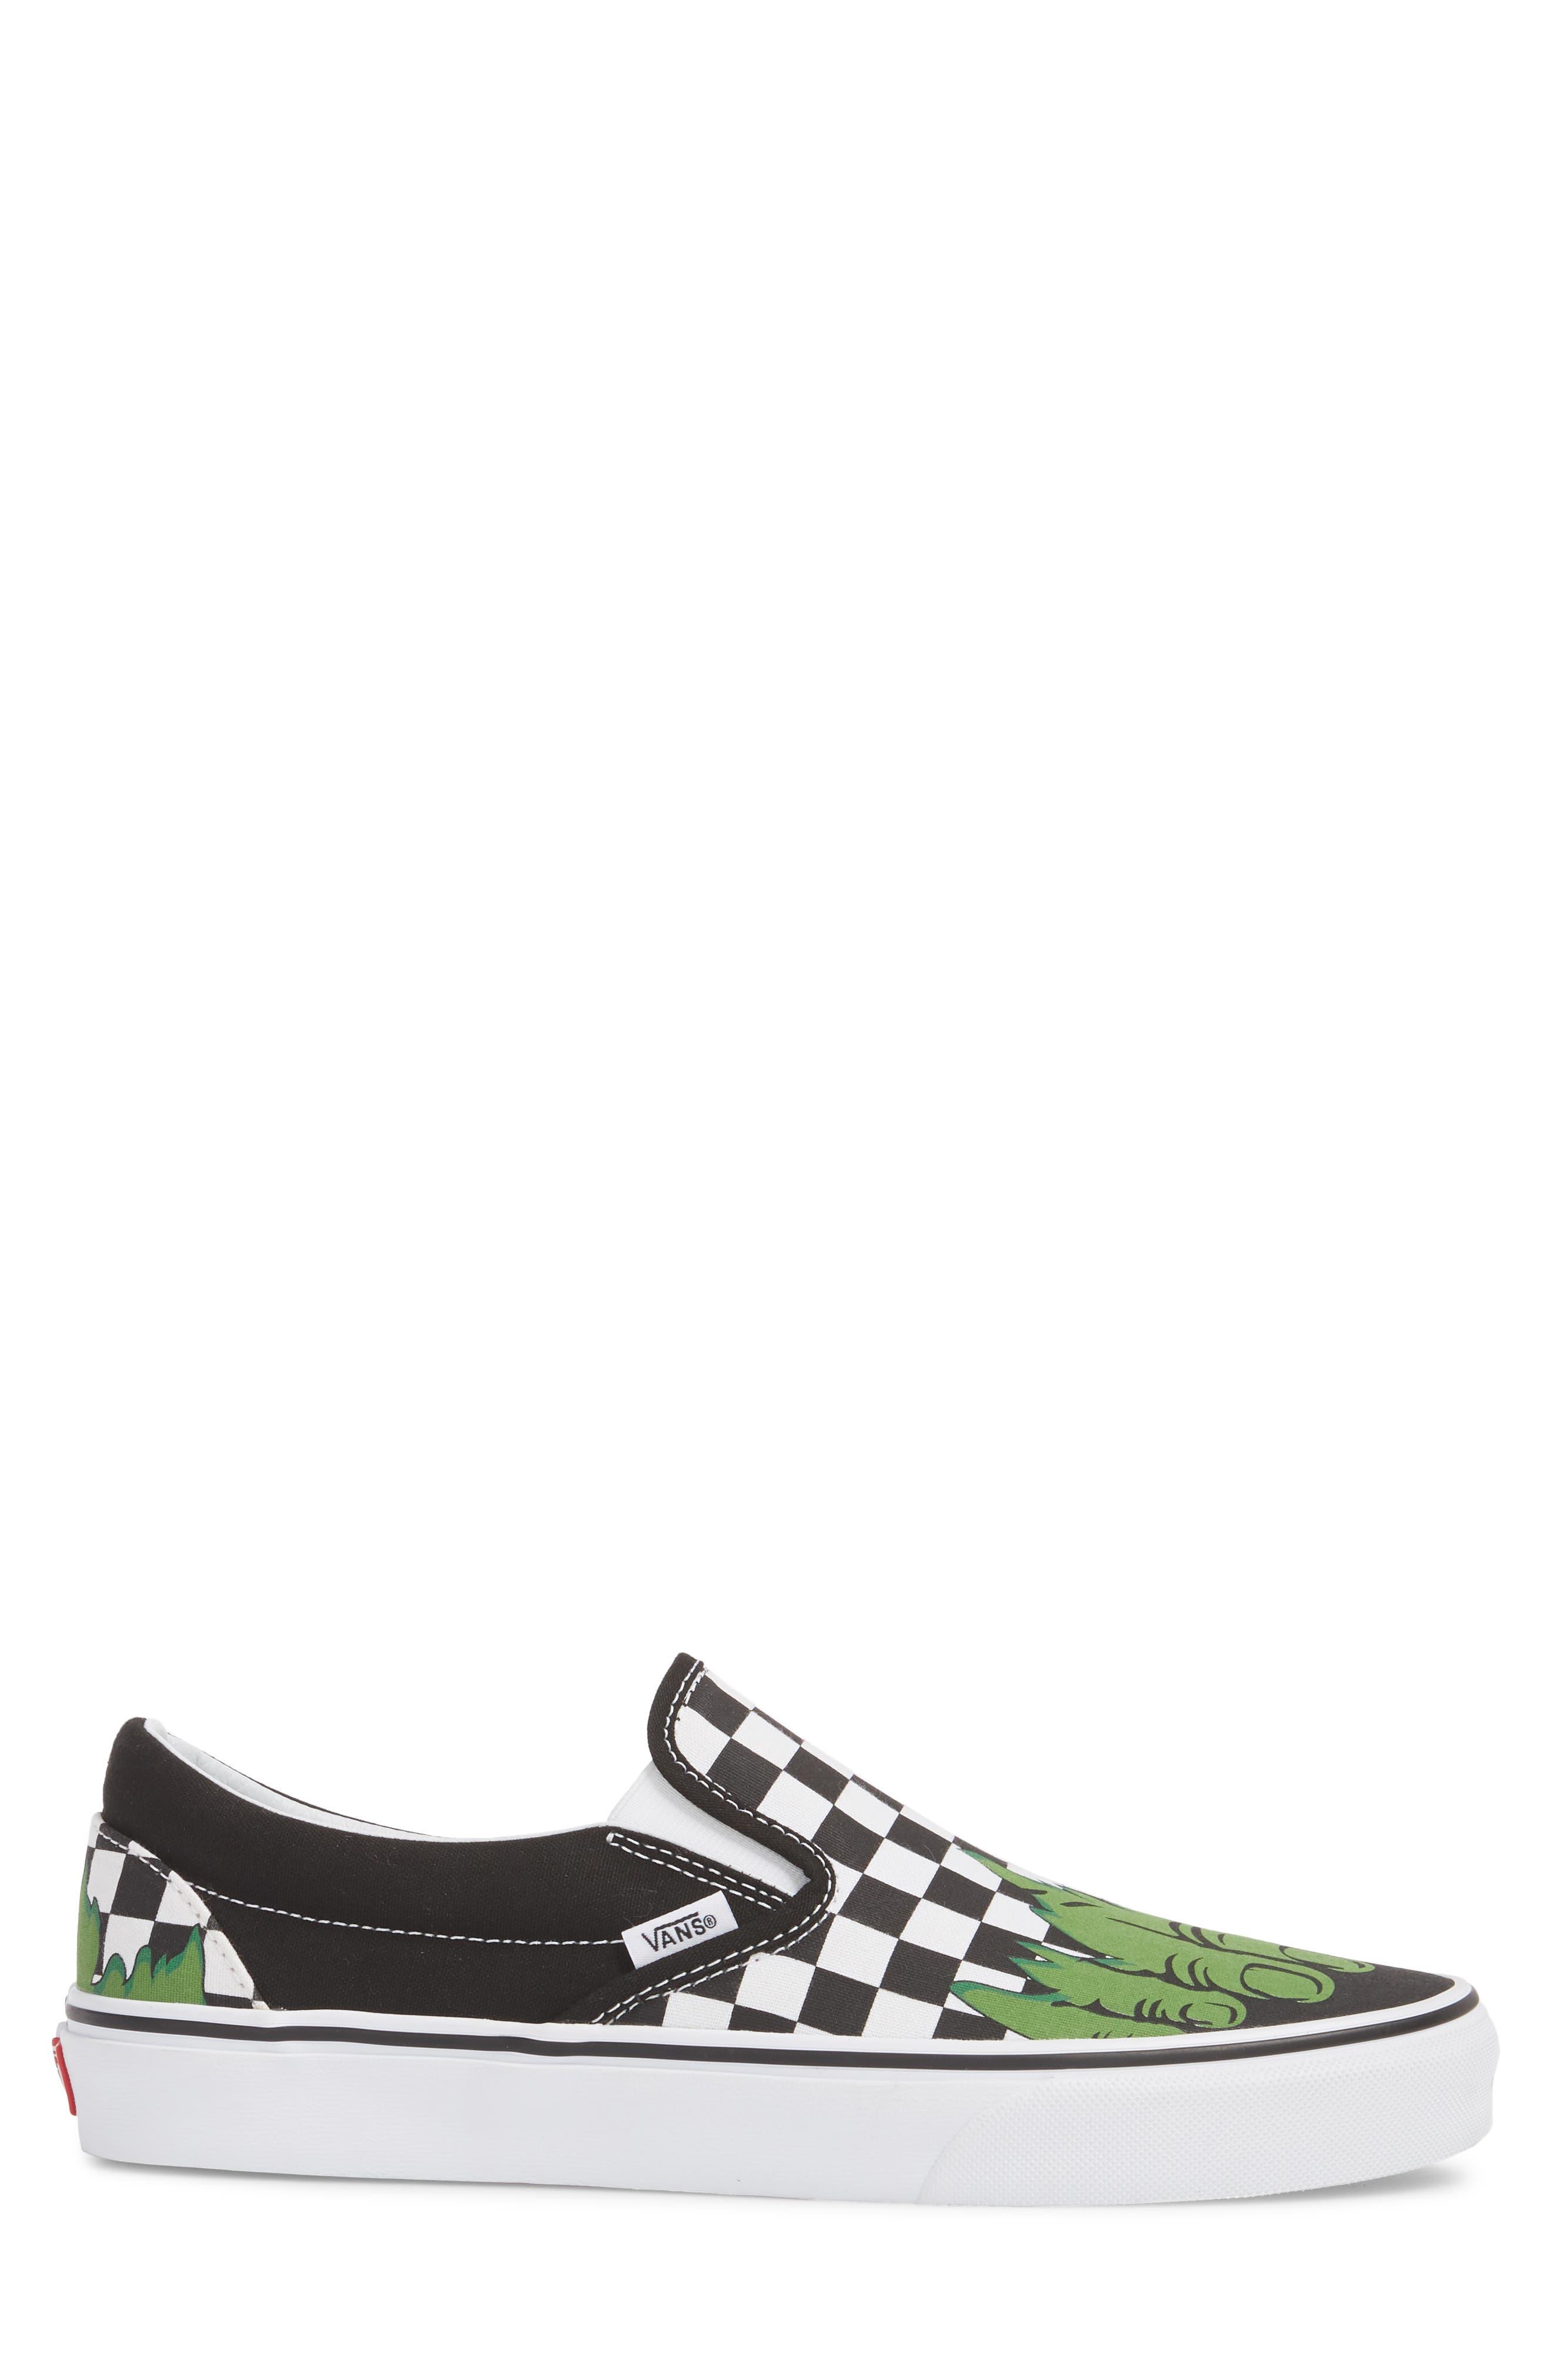 Marvel UA Classic Slip-On Sneaker,                             Alternate thumbnail 4, color,                             Checkerboard Textile